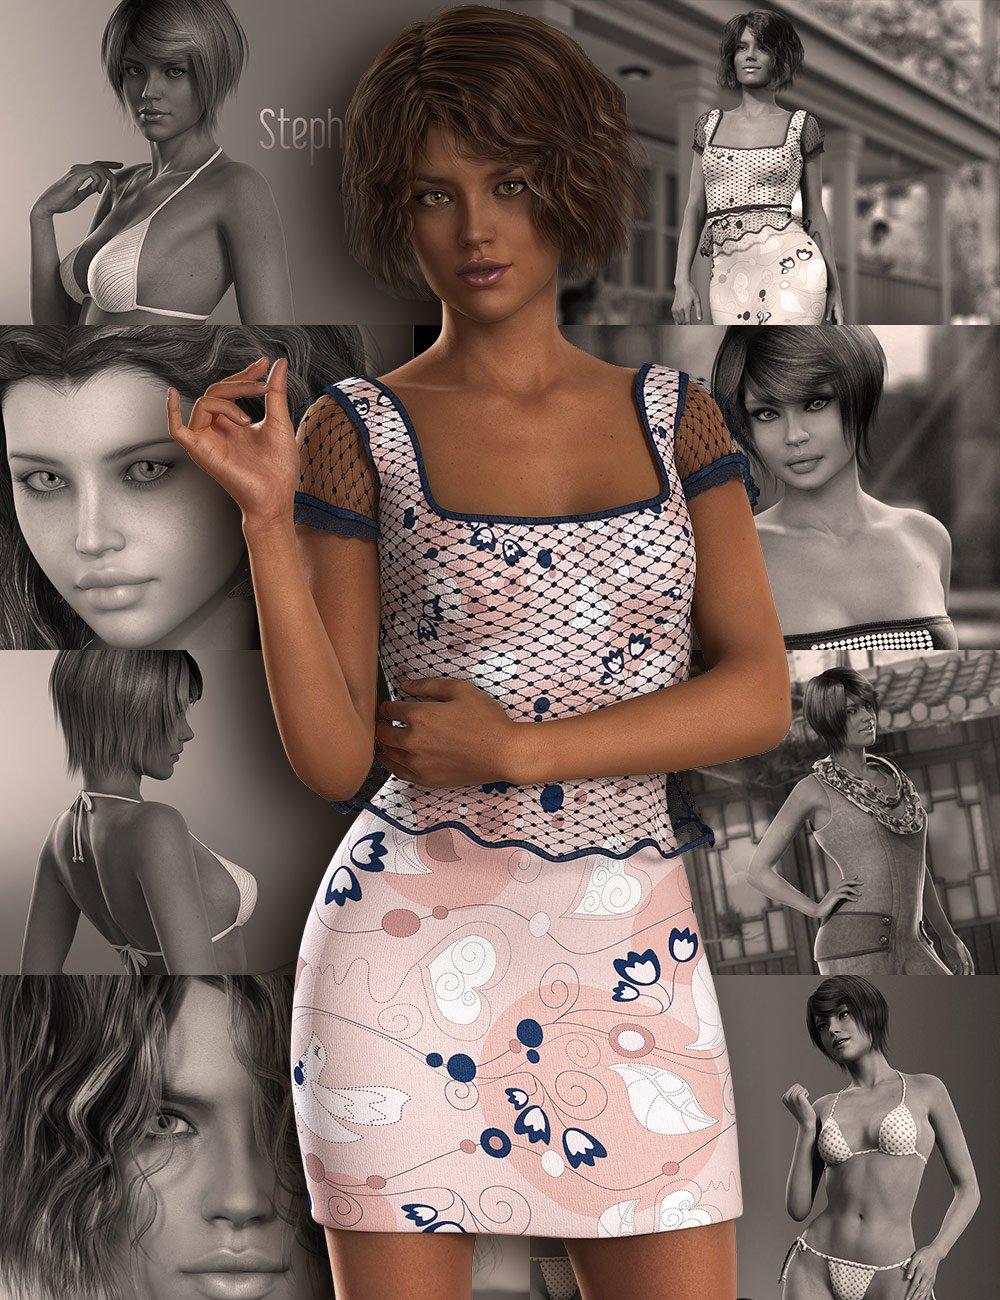 Stephanie 6 Starter Bundle by: , 3D Models by Daz 3D